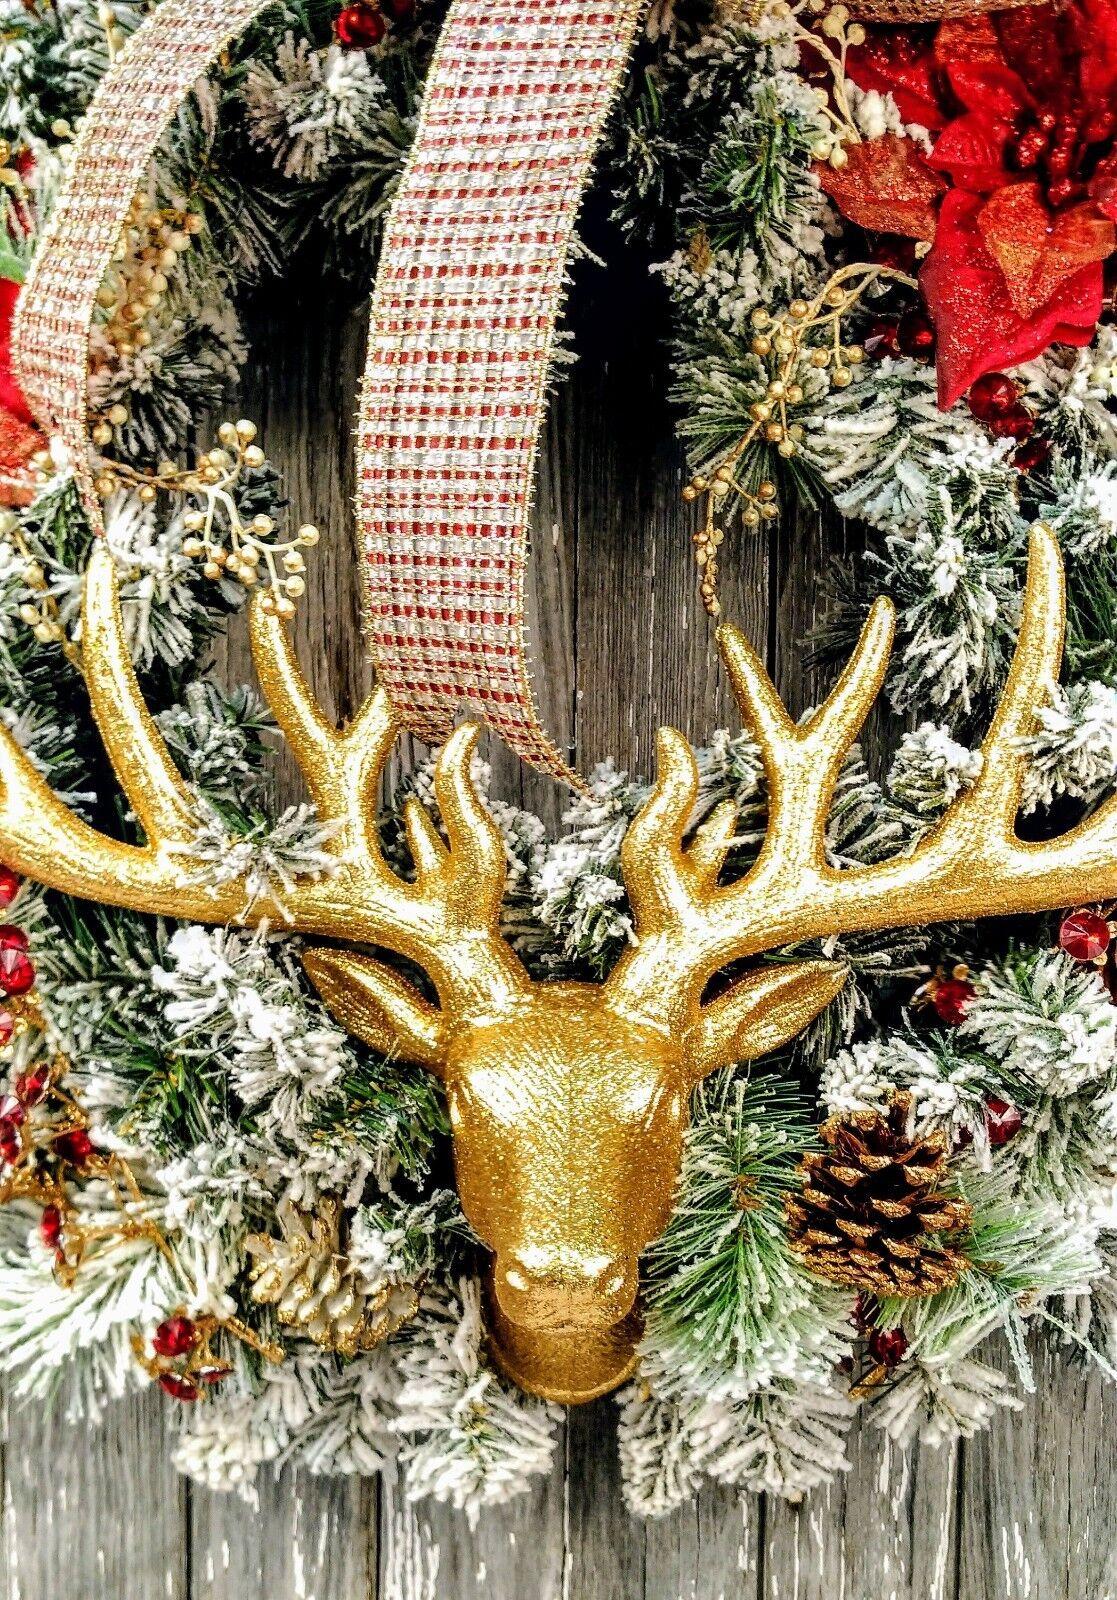 Gold Glitter Deer Head Wall Mount By Raz Christmas 3751013 New